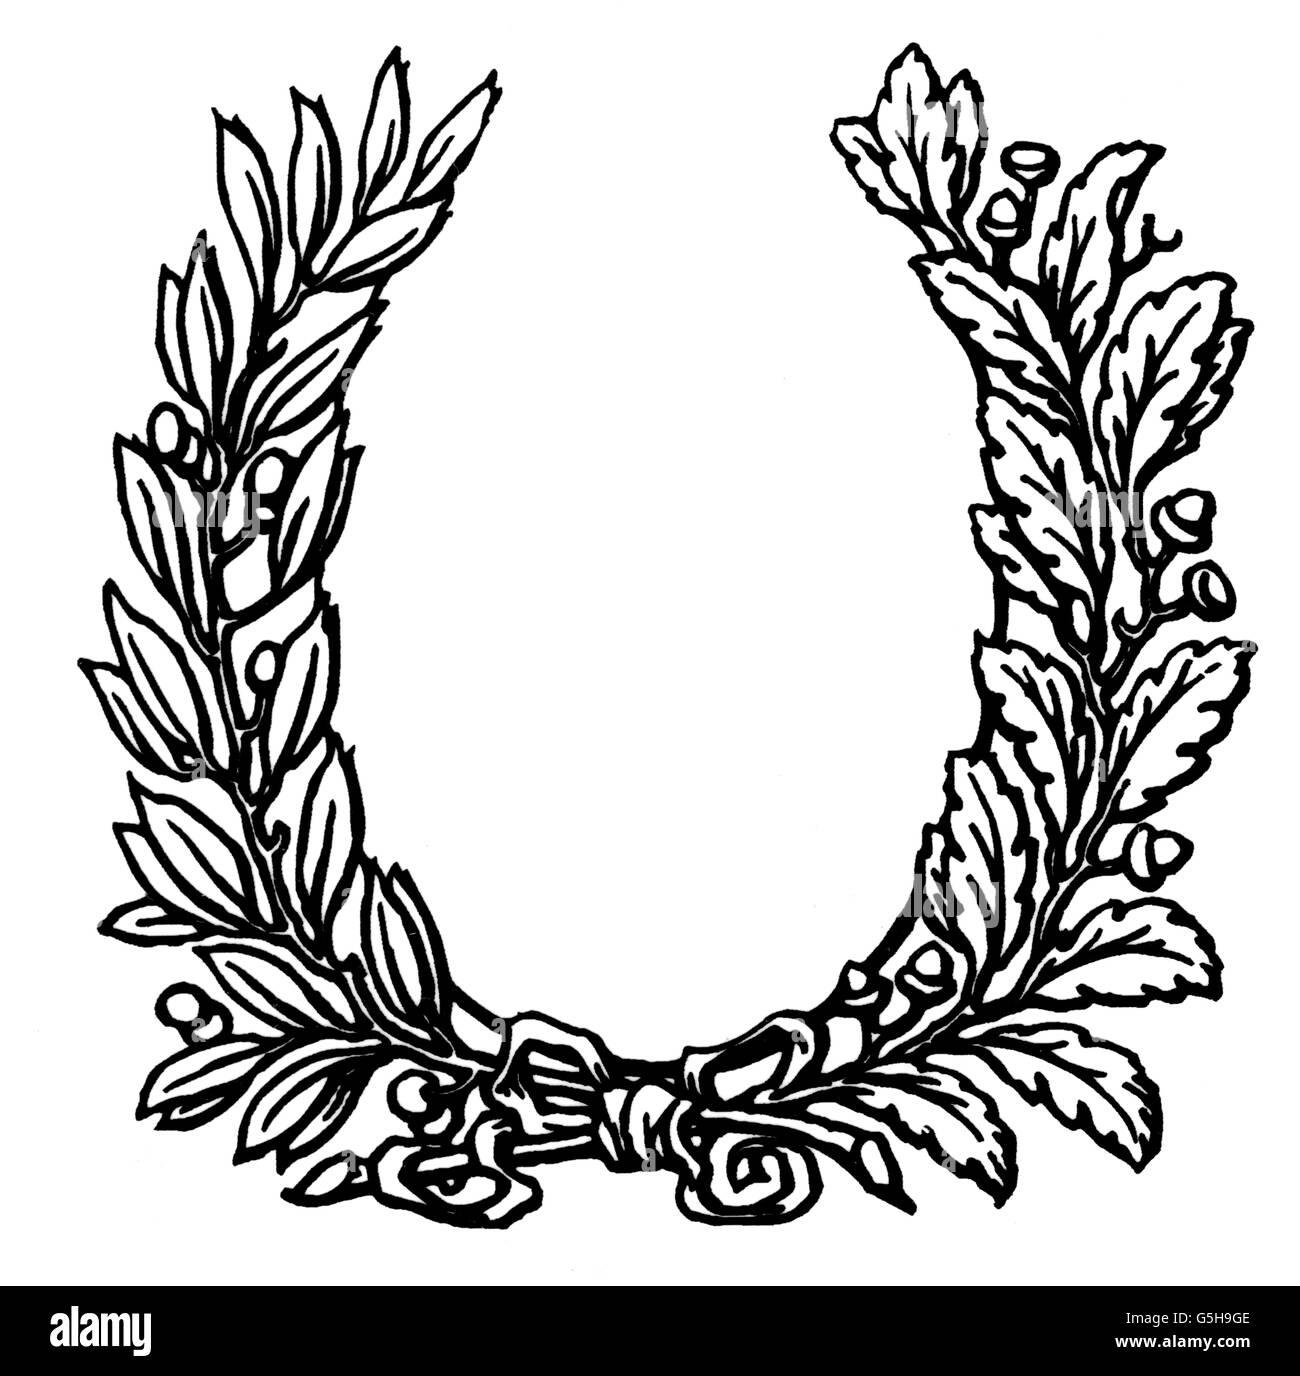 Symbole, Lorbeerkranz, Computergrafik, 90er Jahre, Additional-Rights - Clearences-NA Stockbild